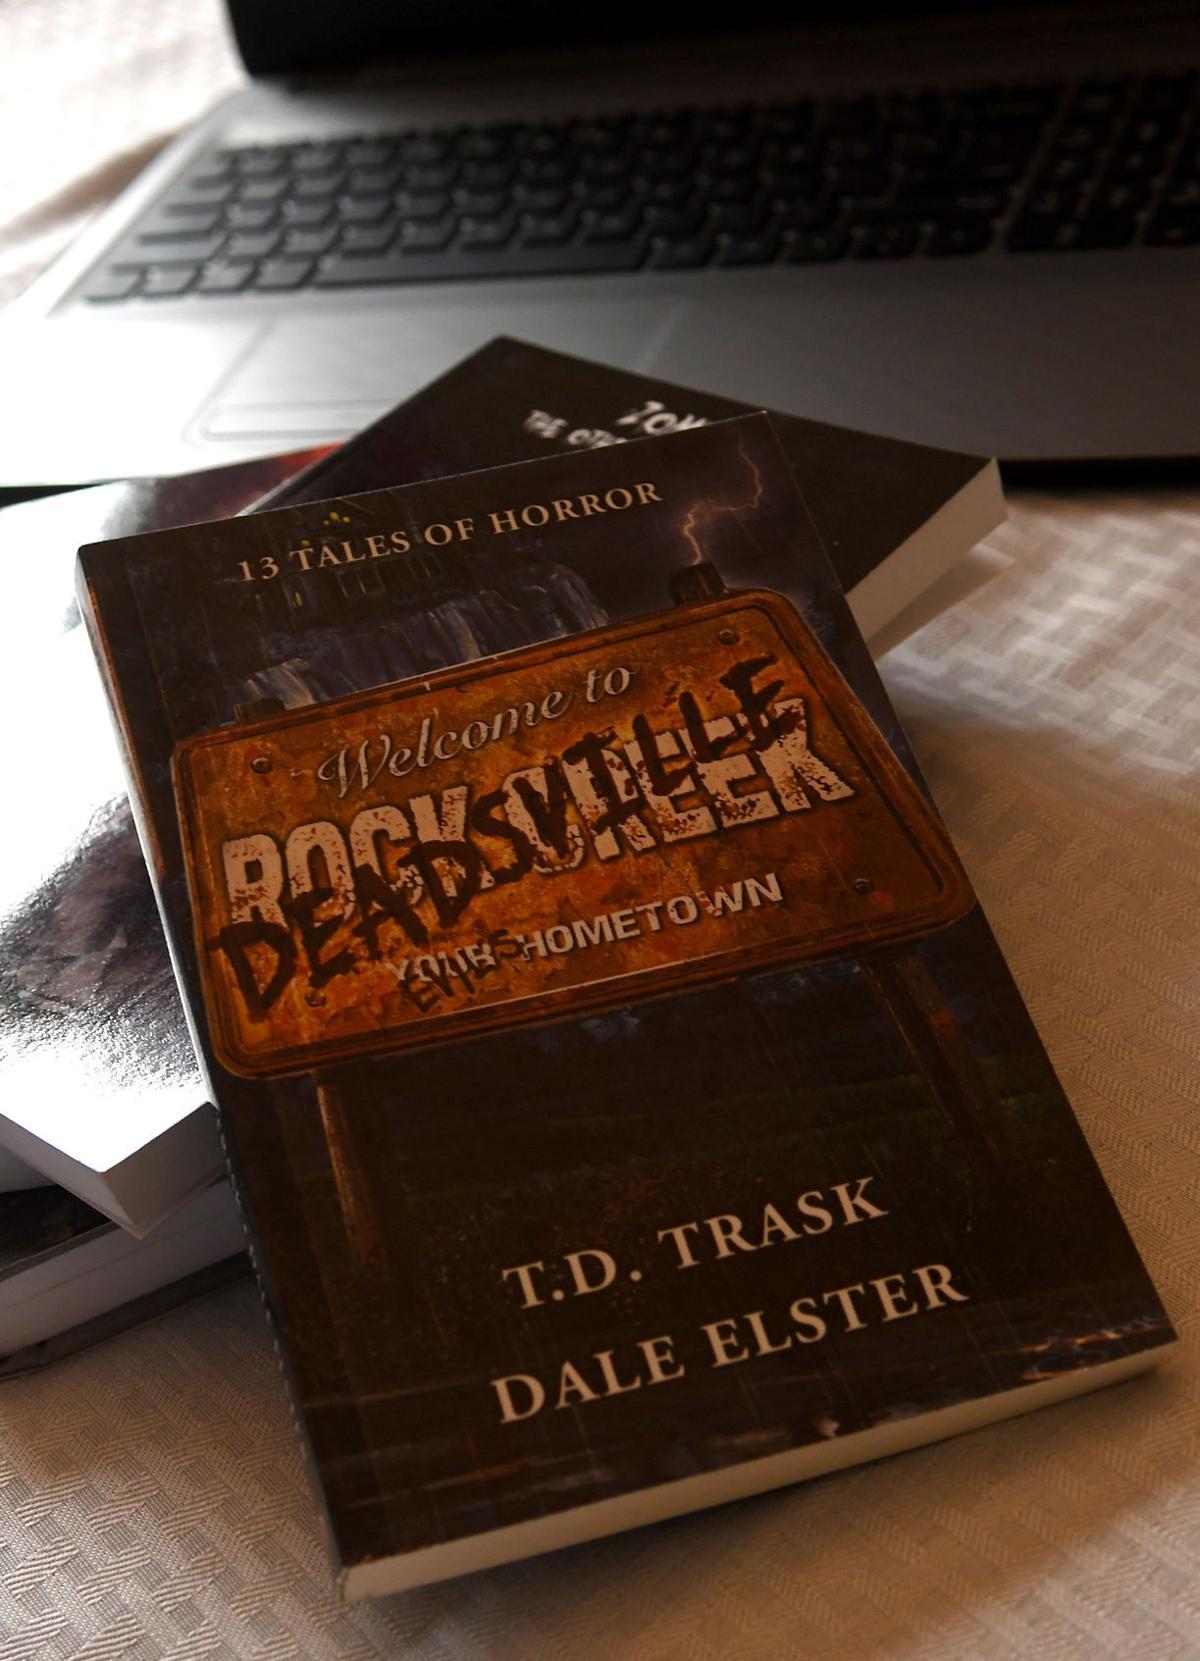 Dale Elster 2